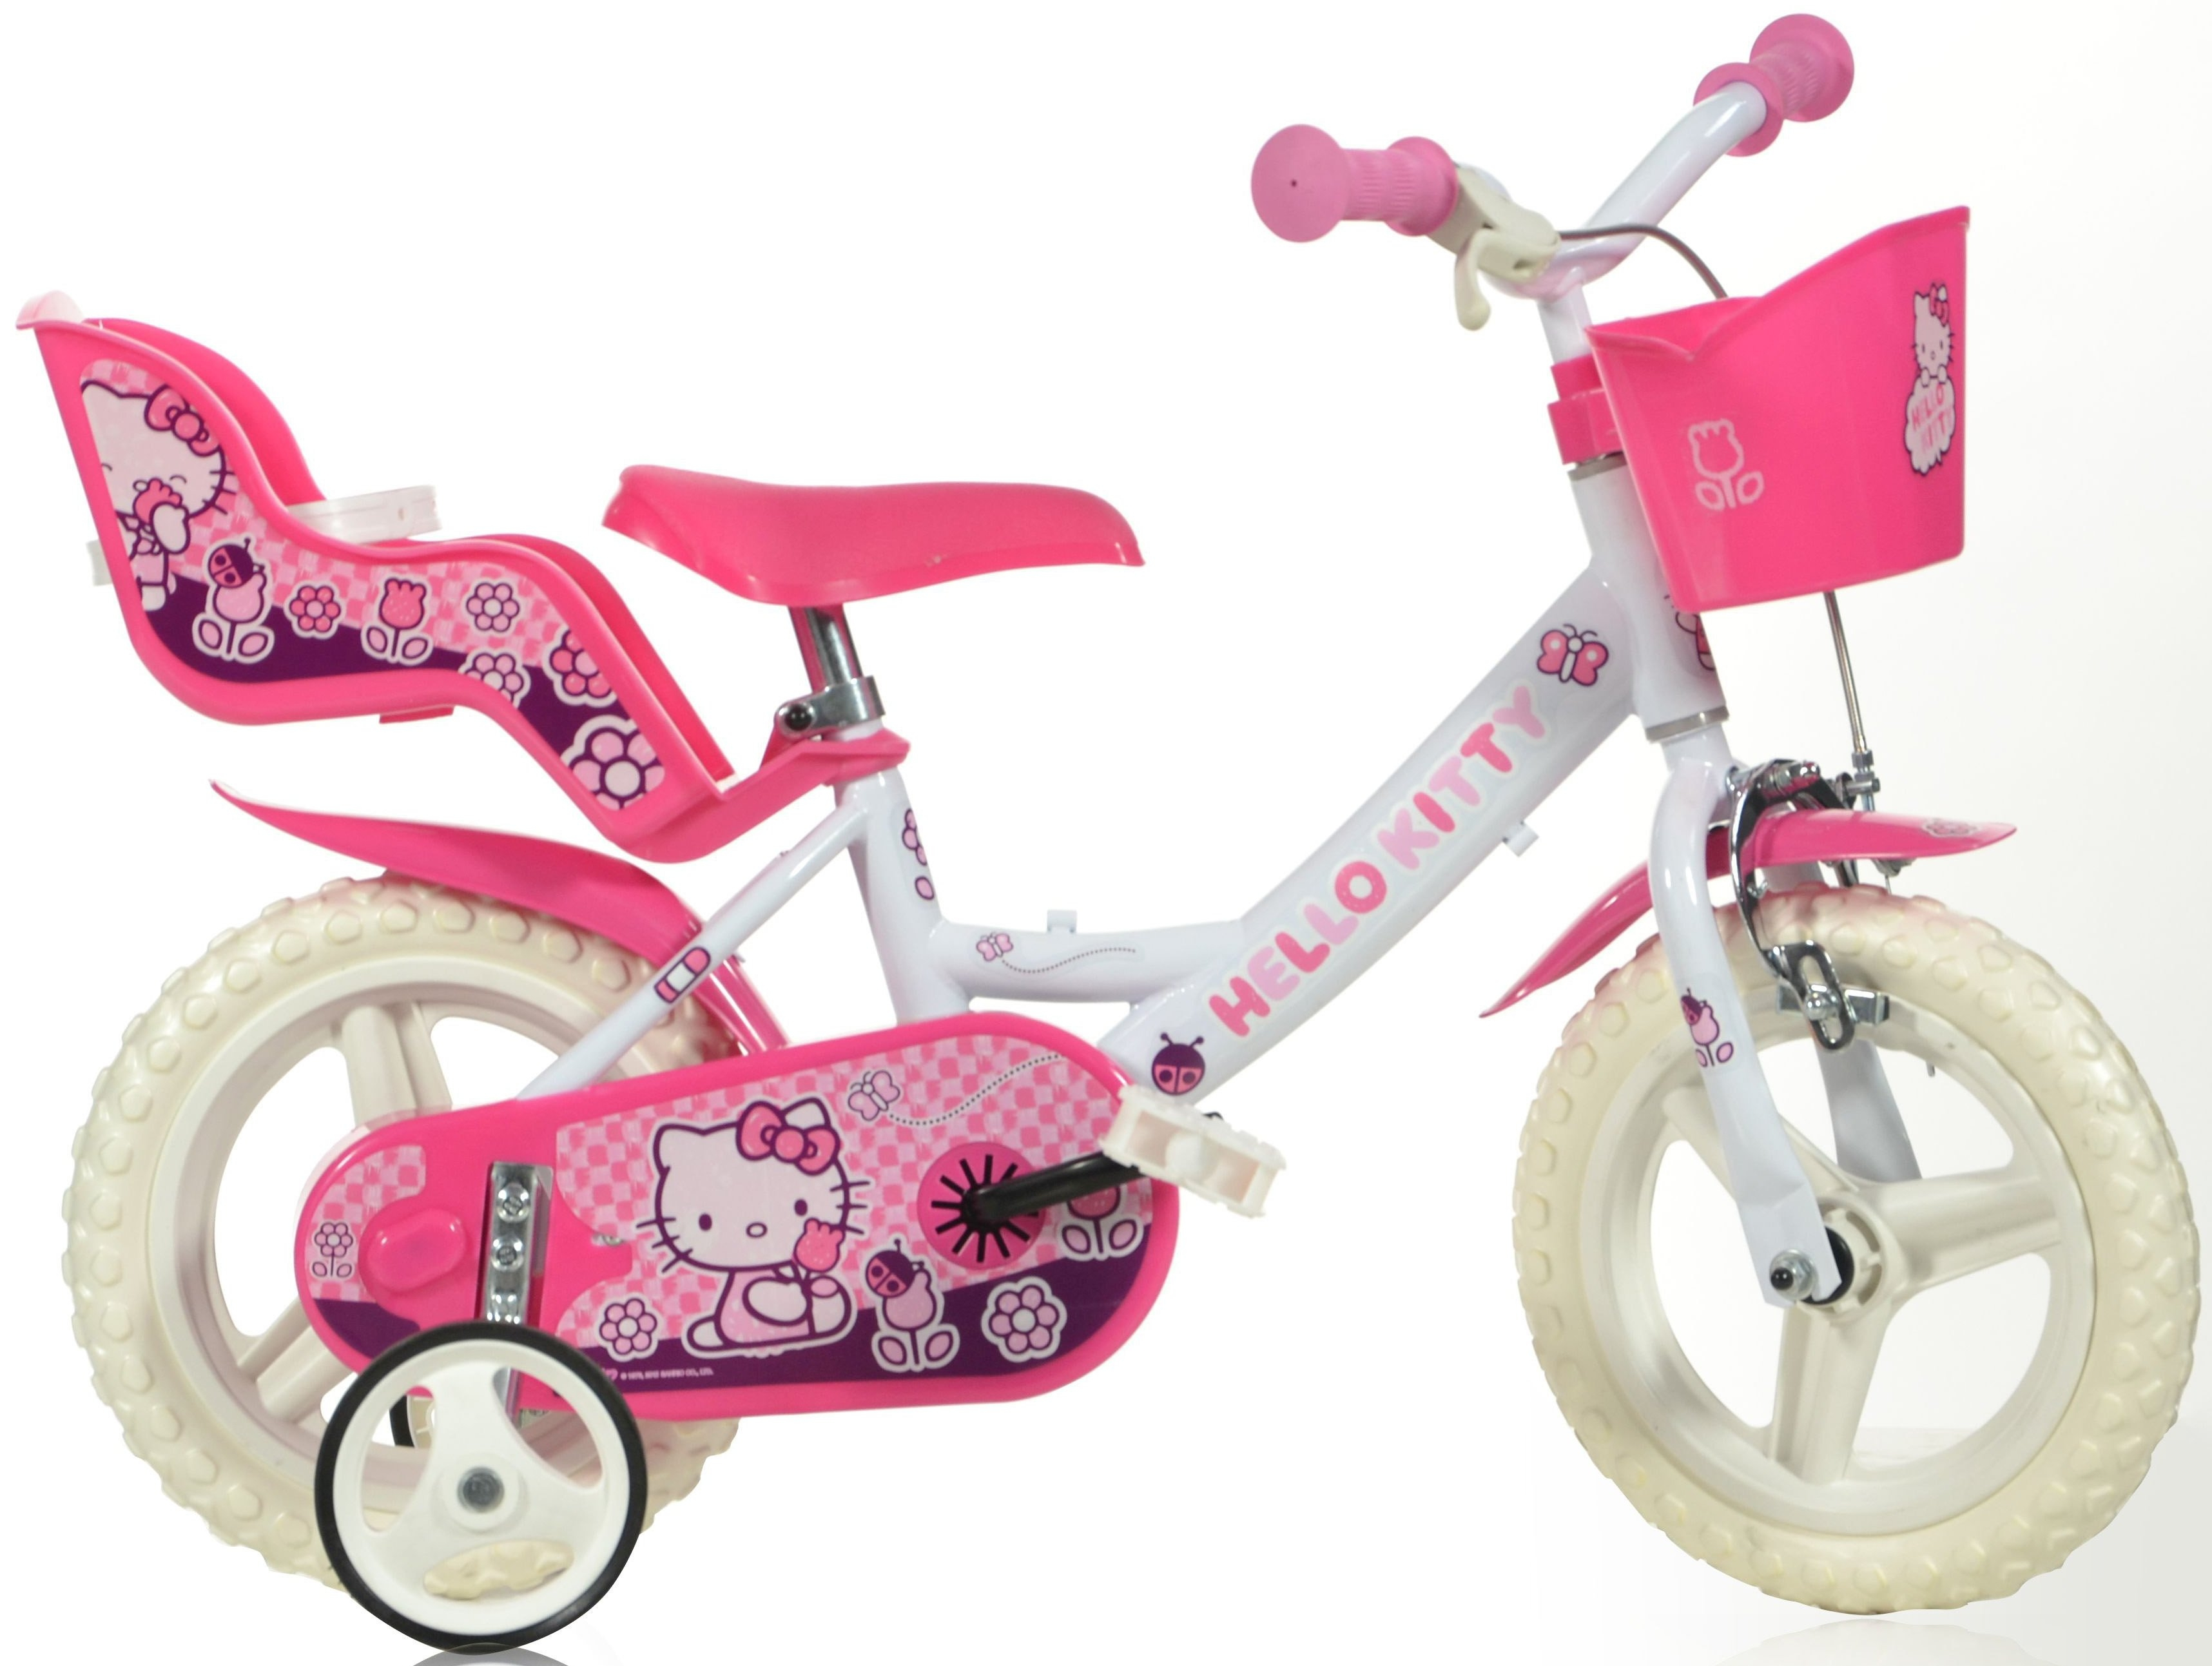 HELLO KITTY Kinderfiets, 12 inch, met stuurmand + poppenzitje, »Hello Kitty« goedkoop op otto.nl kopen